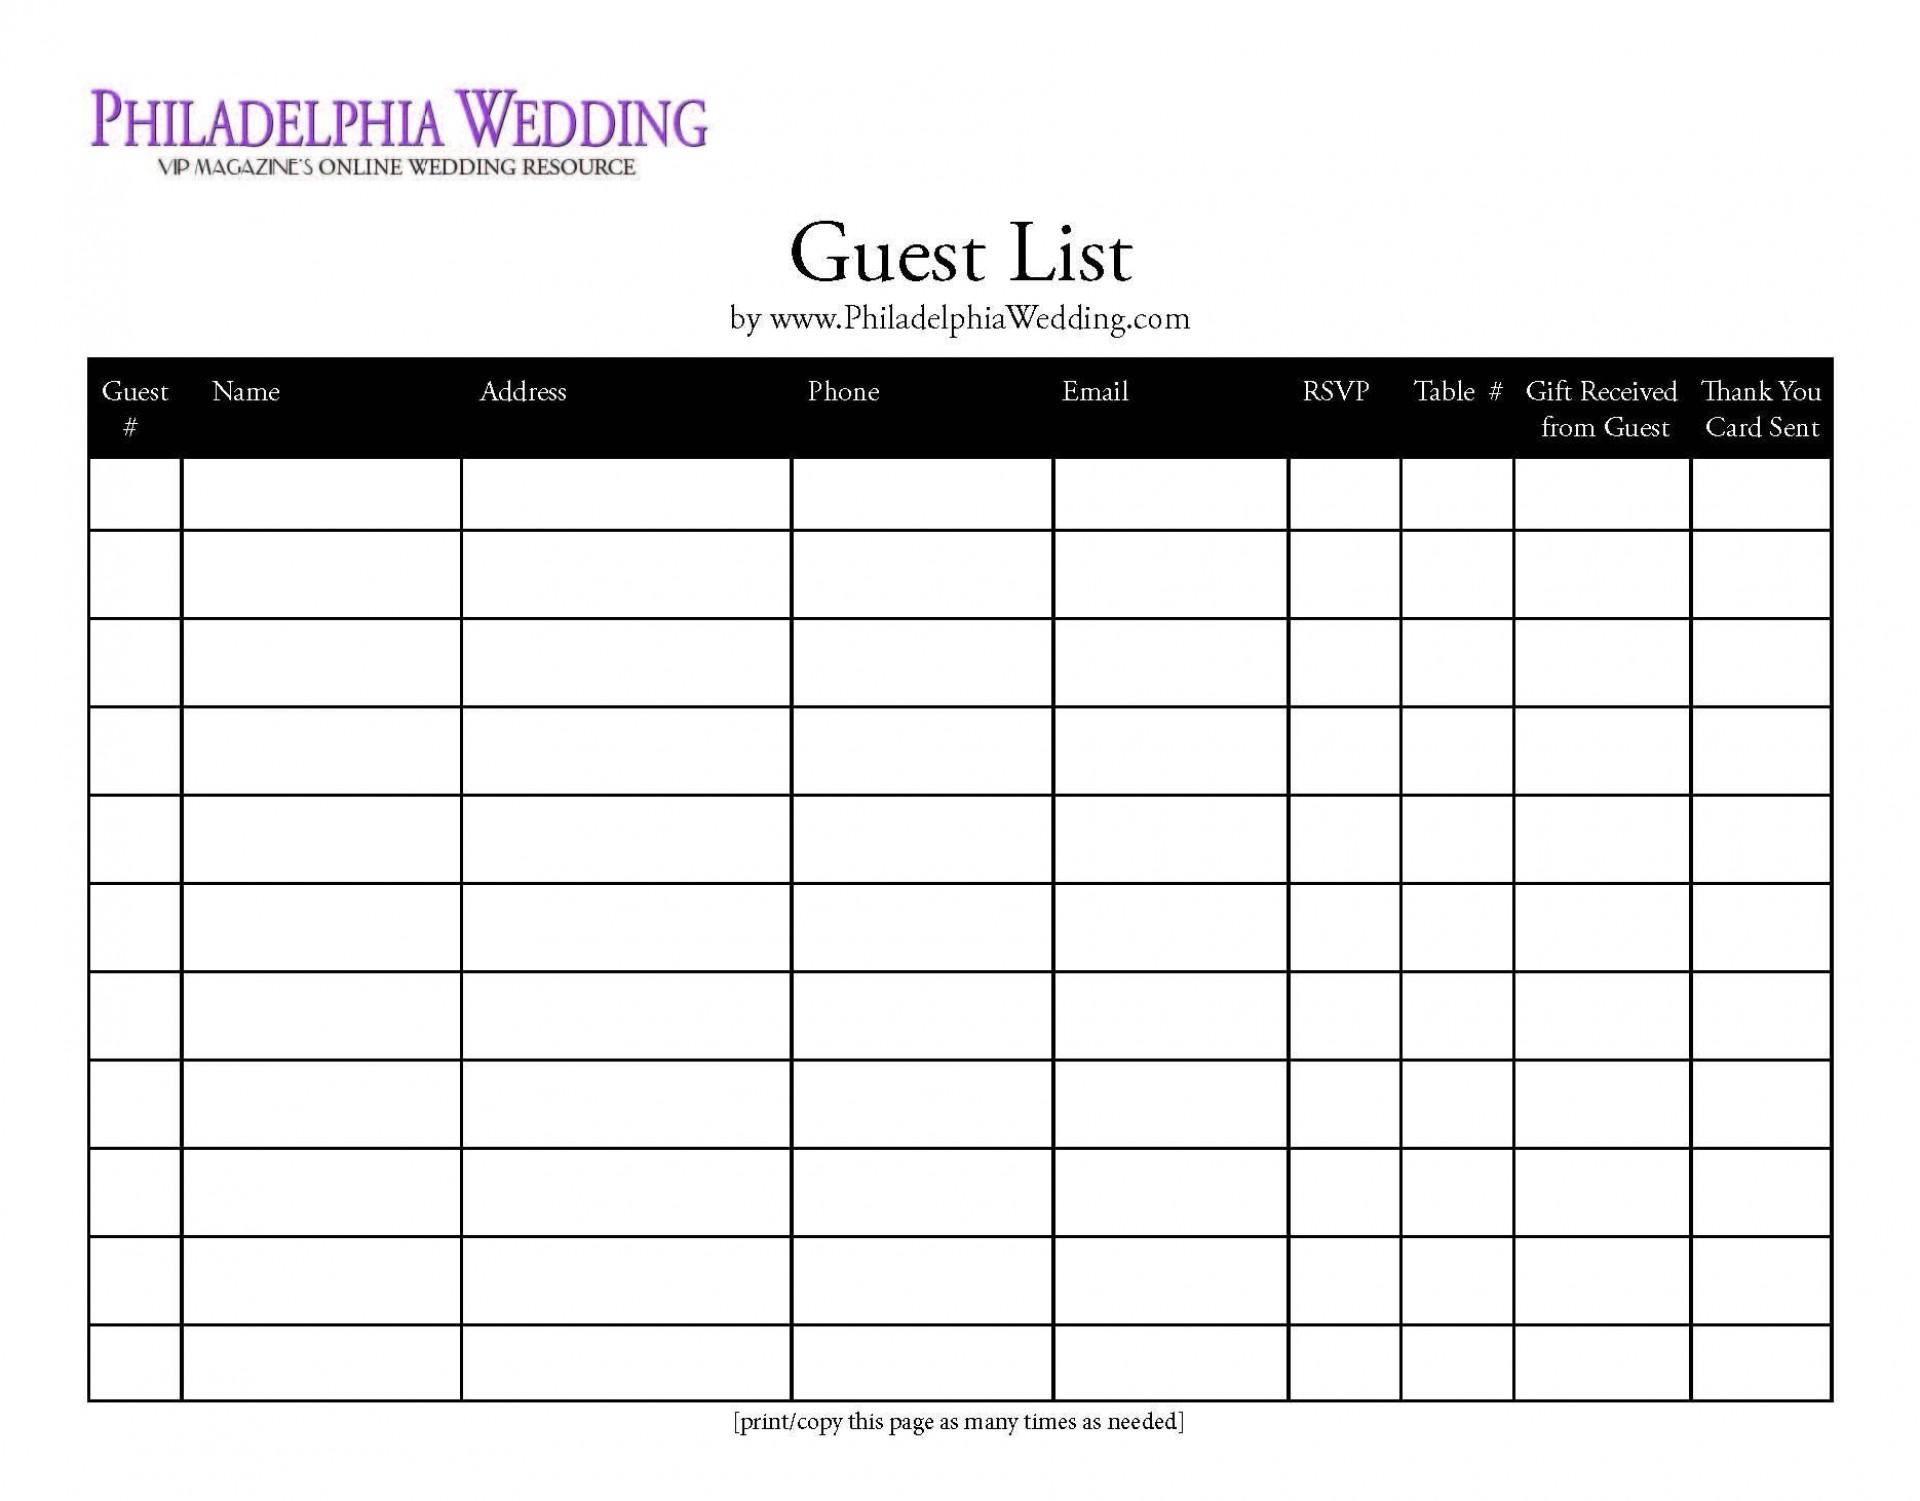 000 Singular Wedding Guest List Template Excel Download Concept 1920